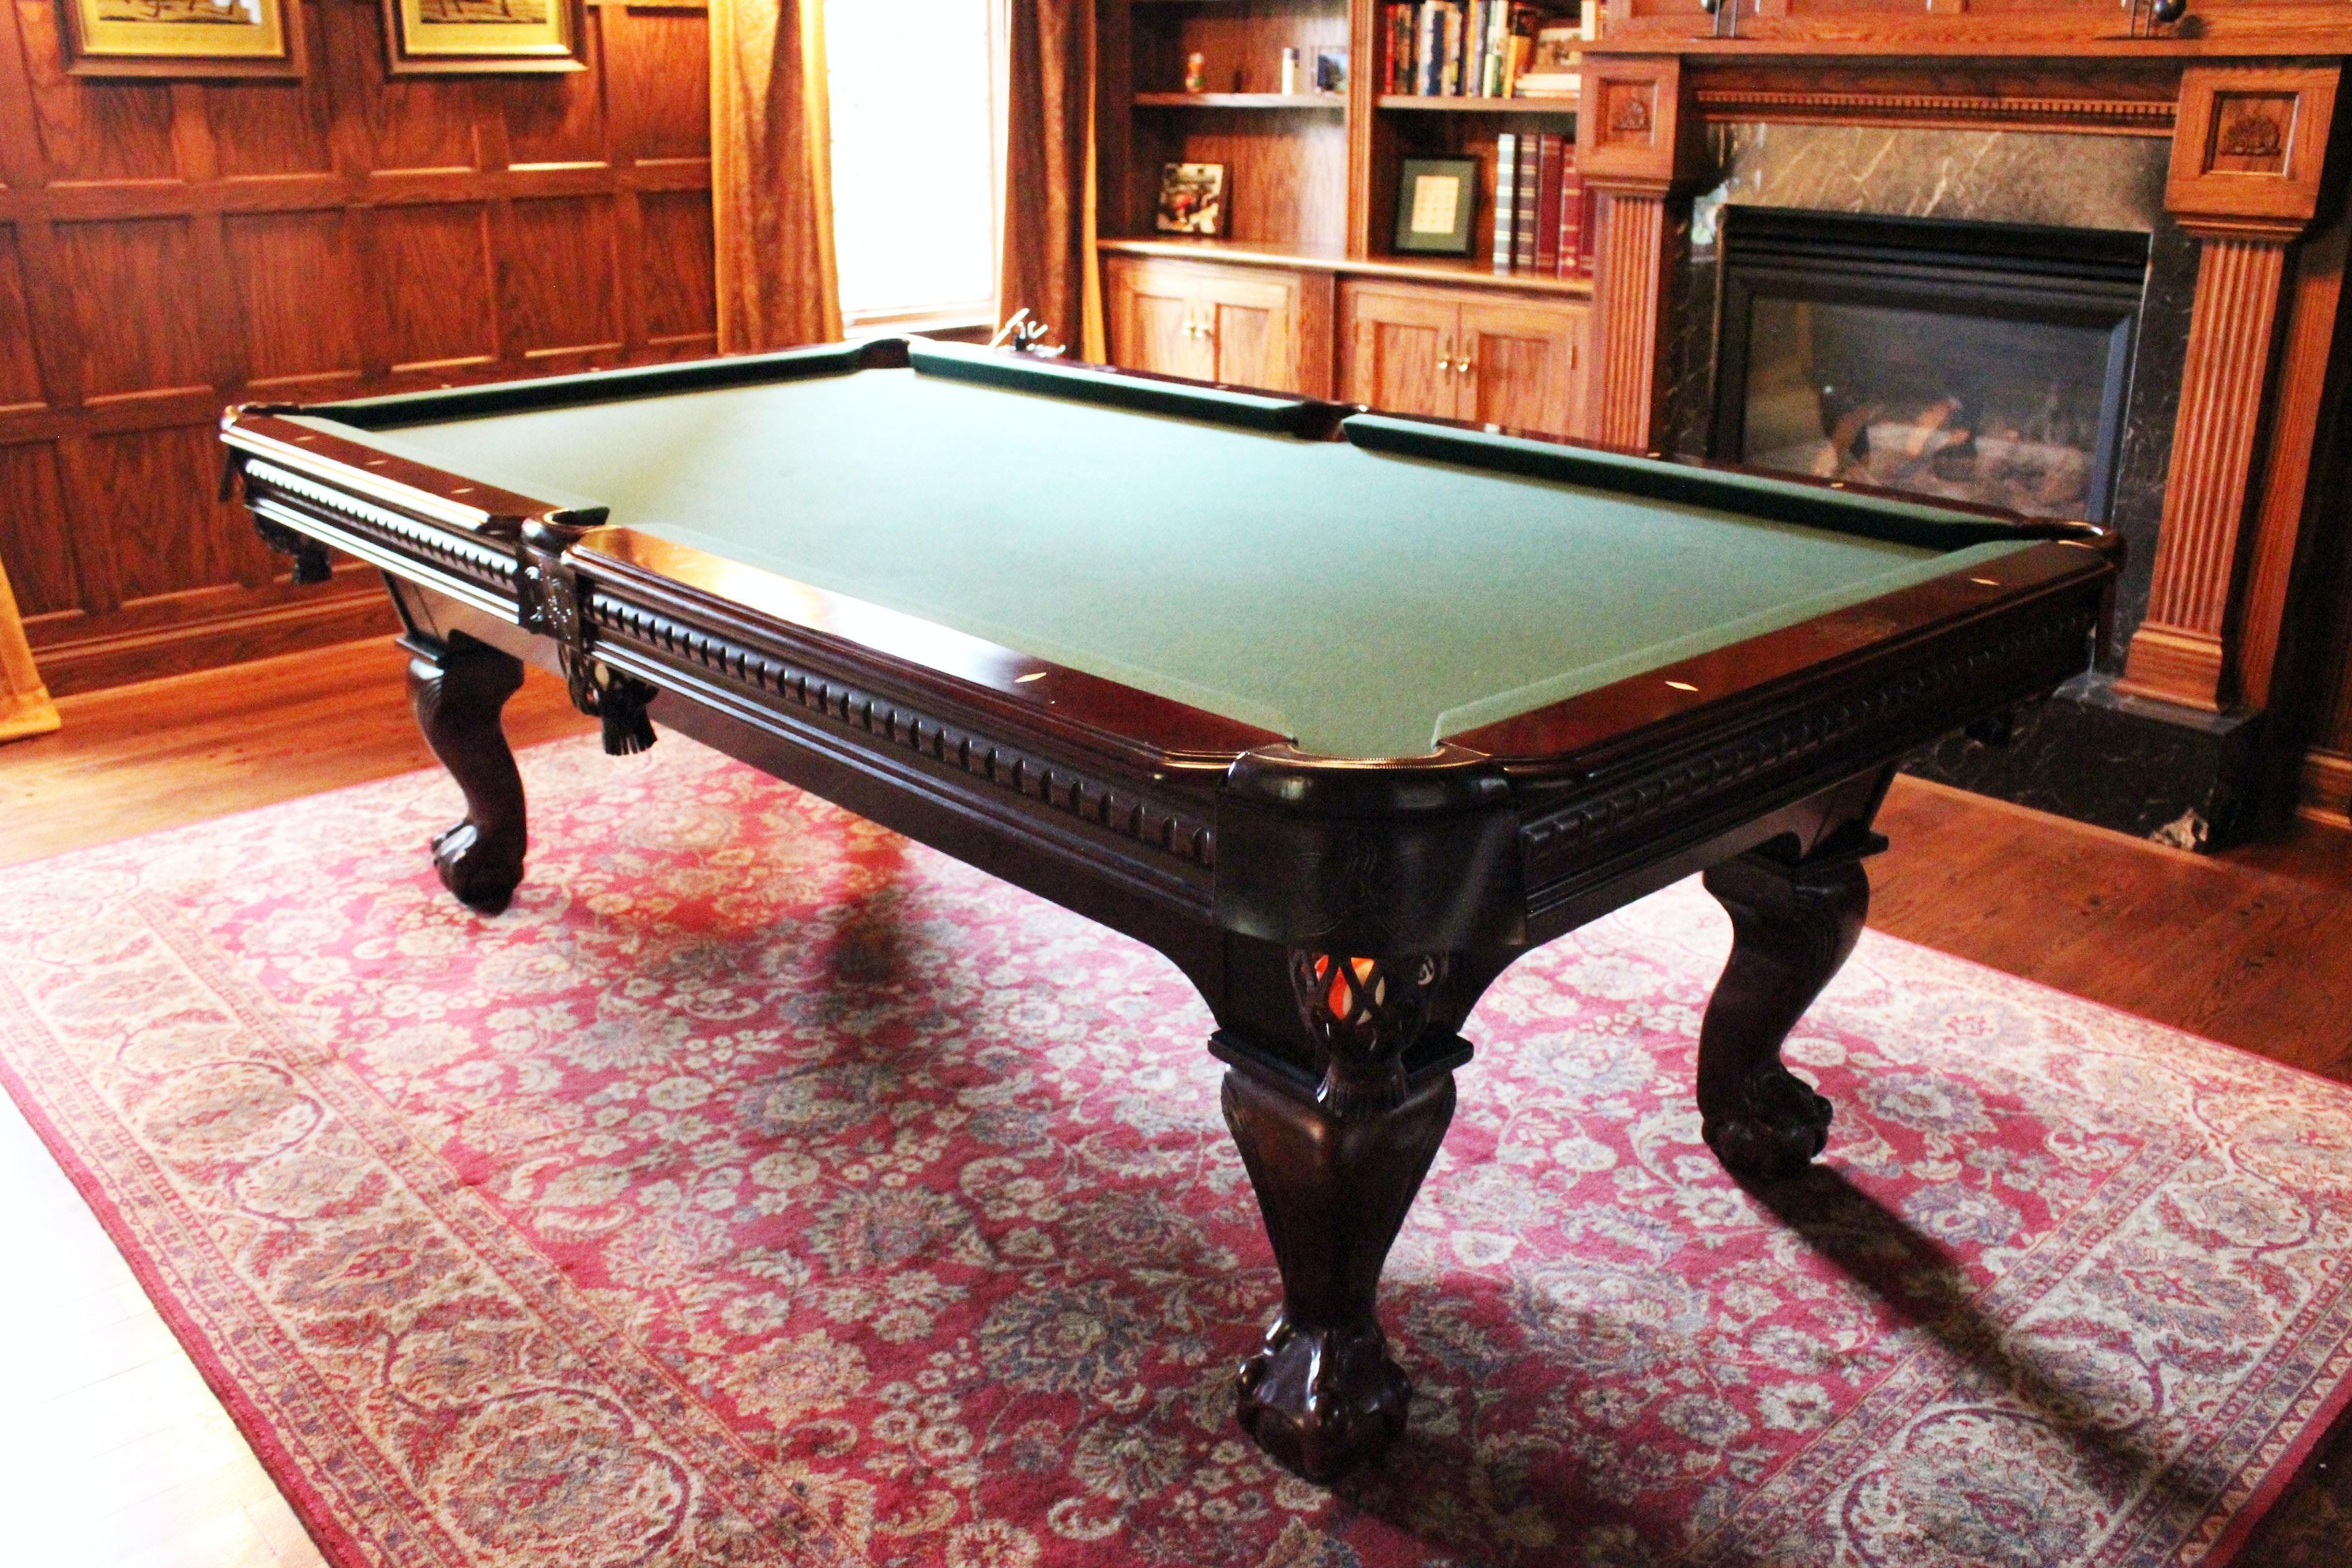 Chippendale Style Elephant Balls Ltd. Billiards Table